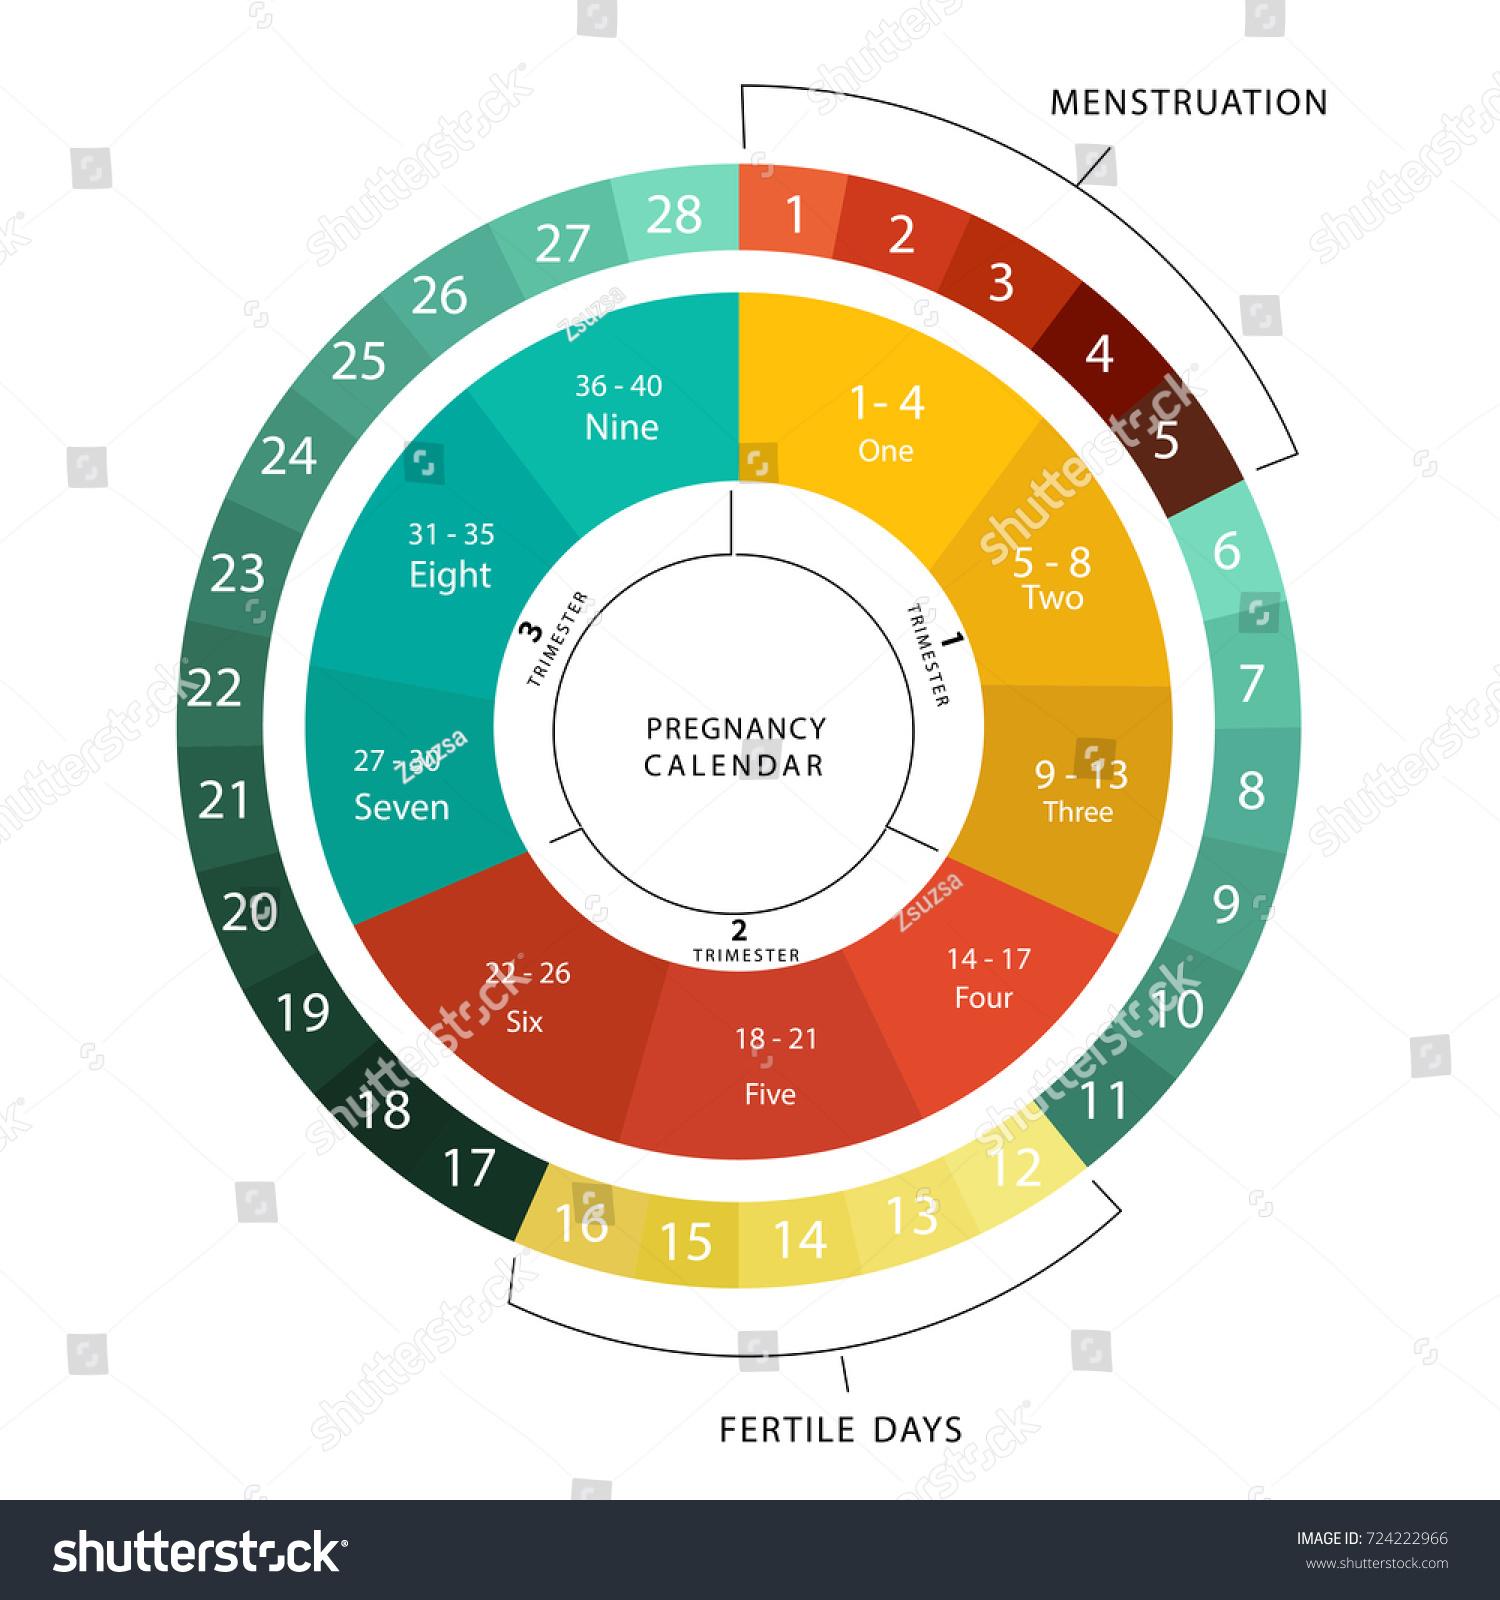 pregnancy menstural calendar circle design color stock vector